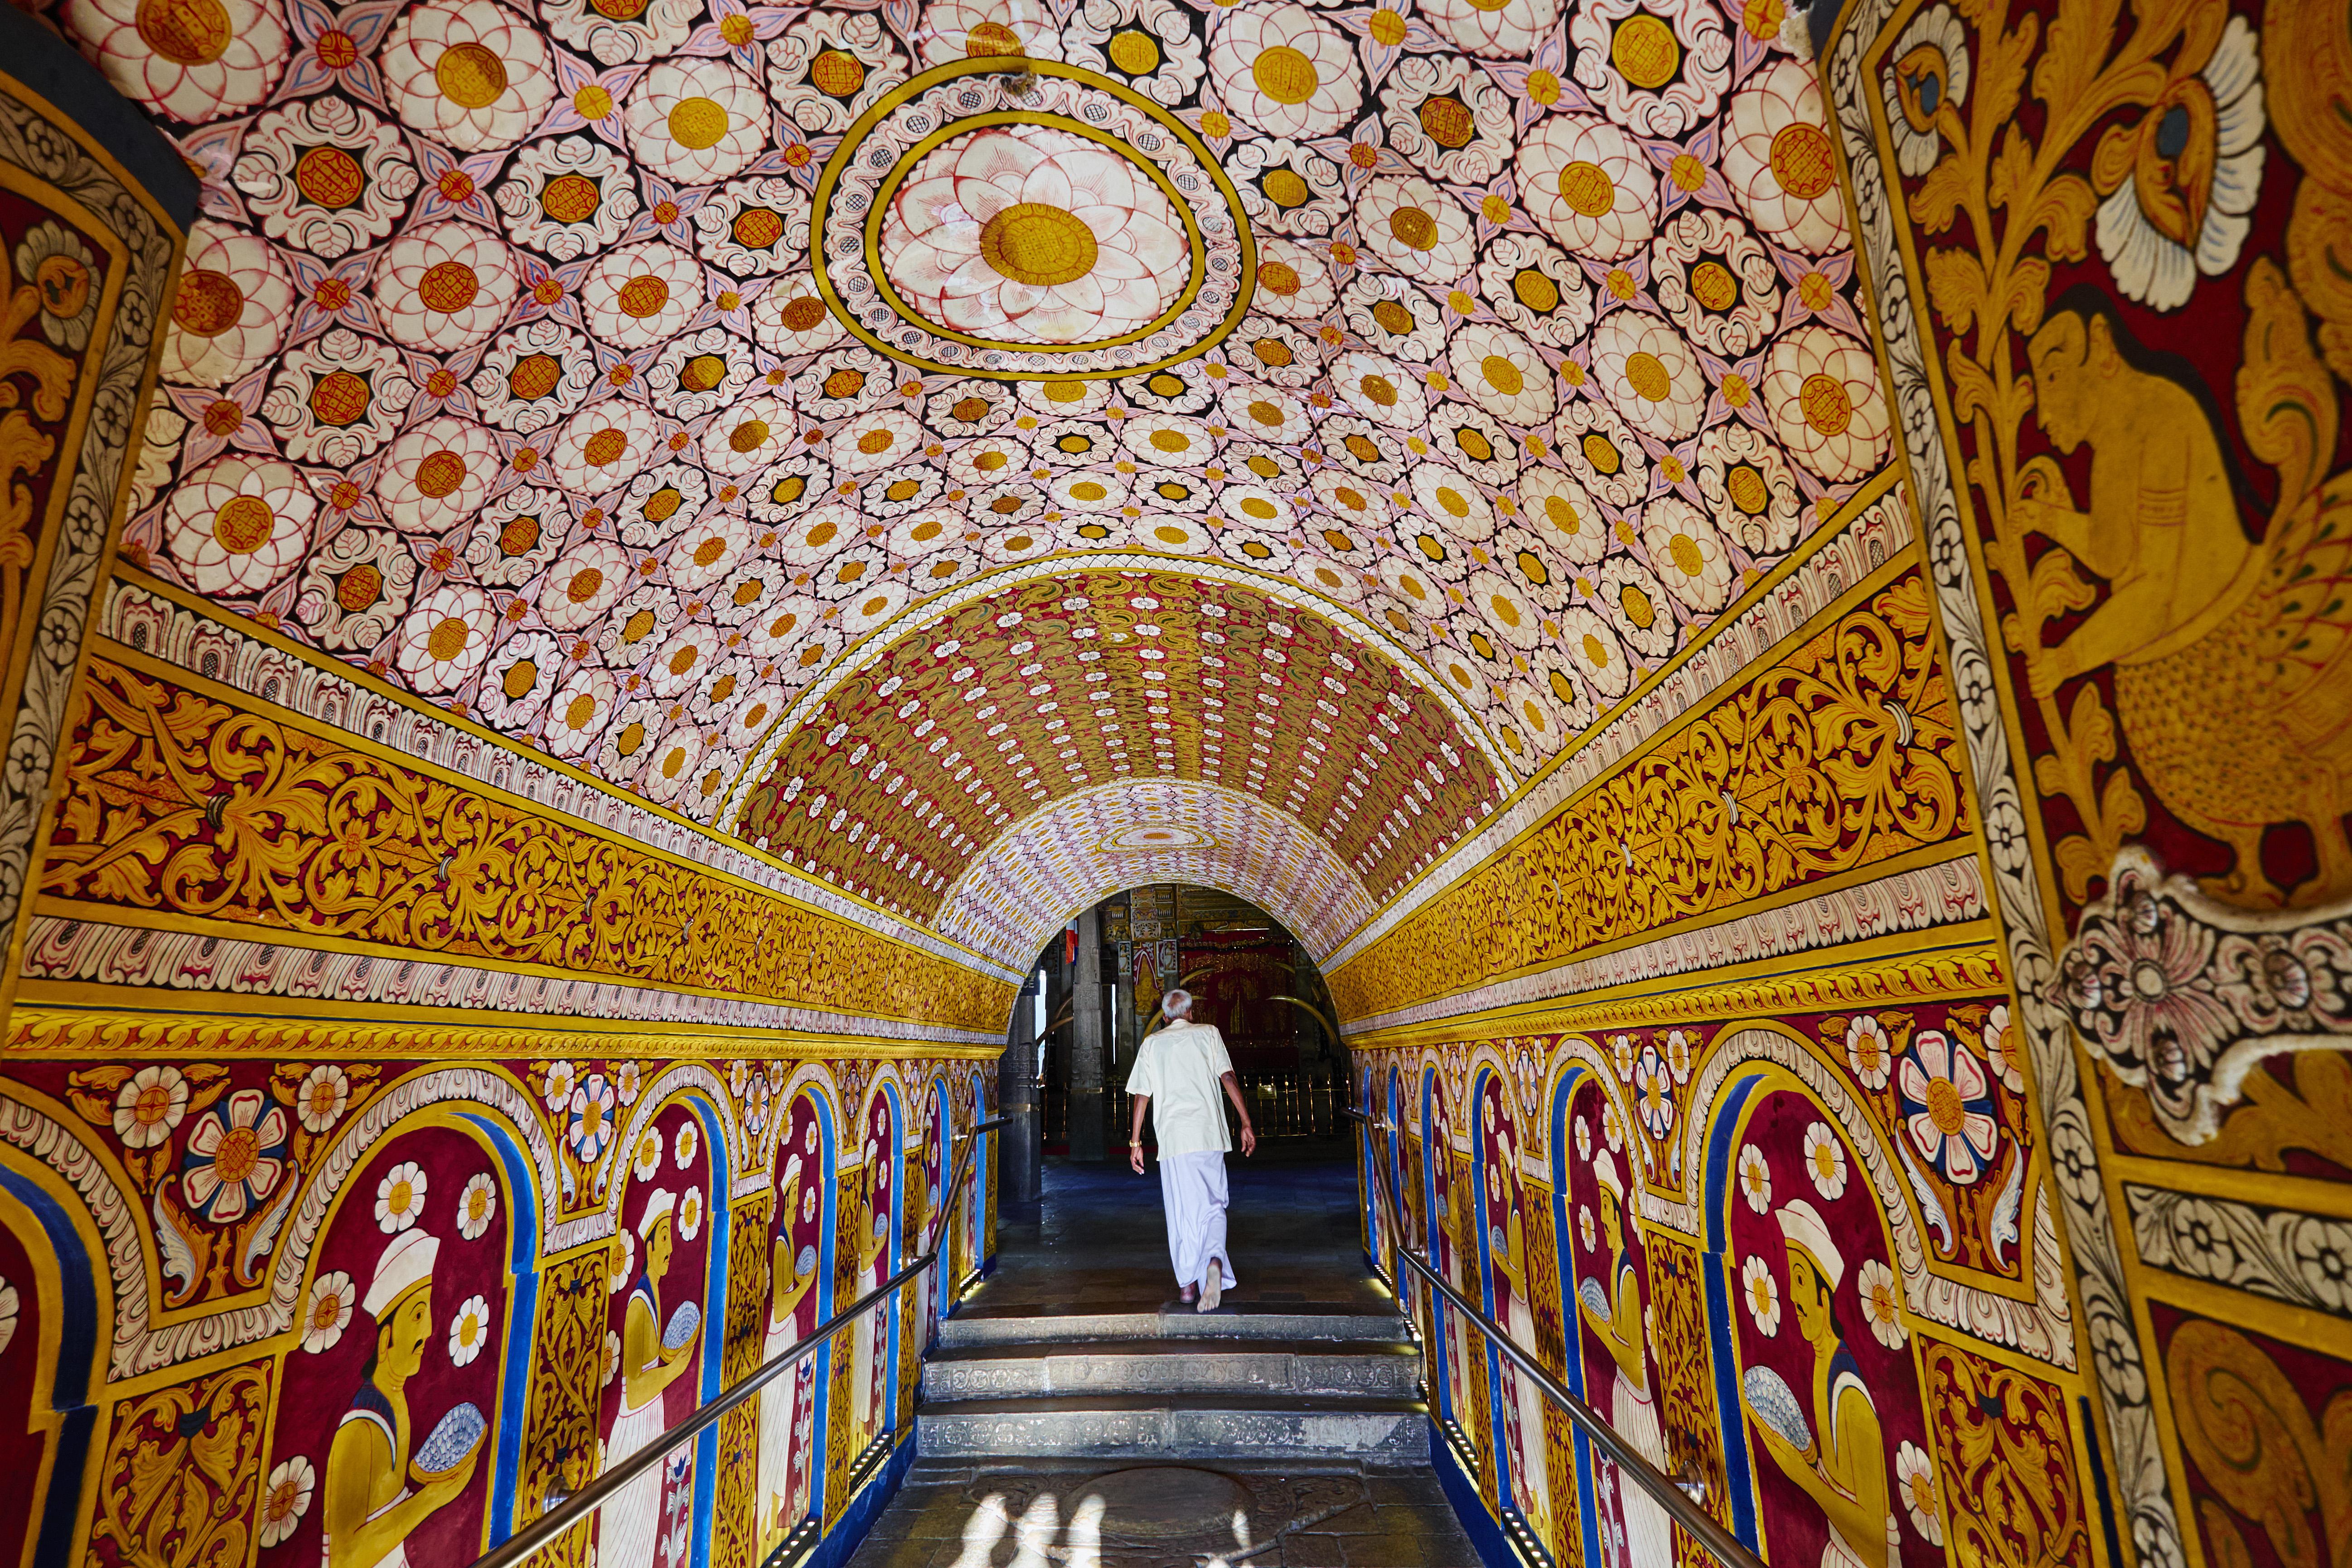 Sri Lanka, Kandy, Tooth's temple